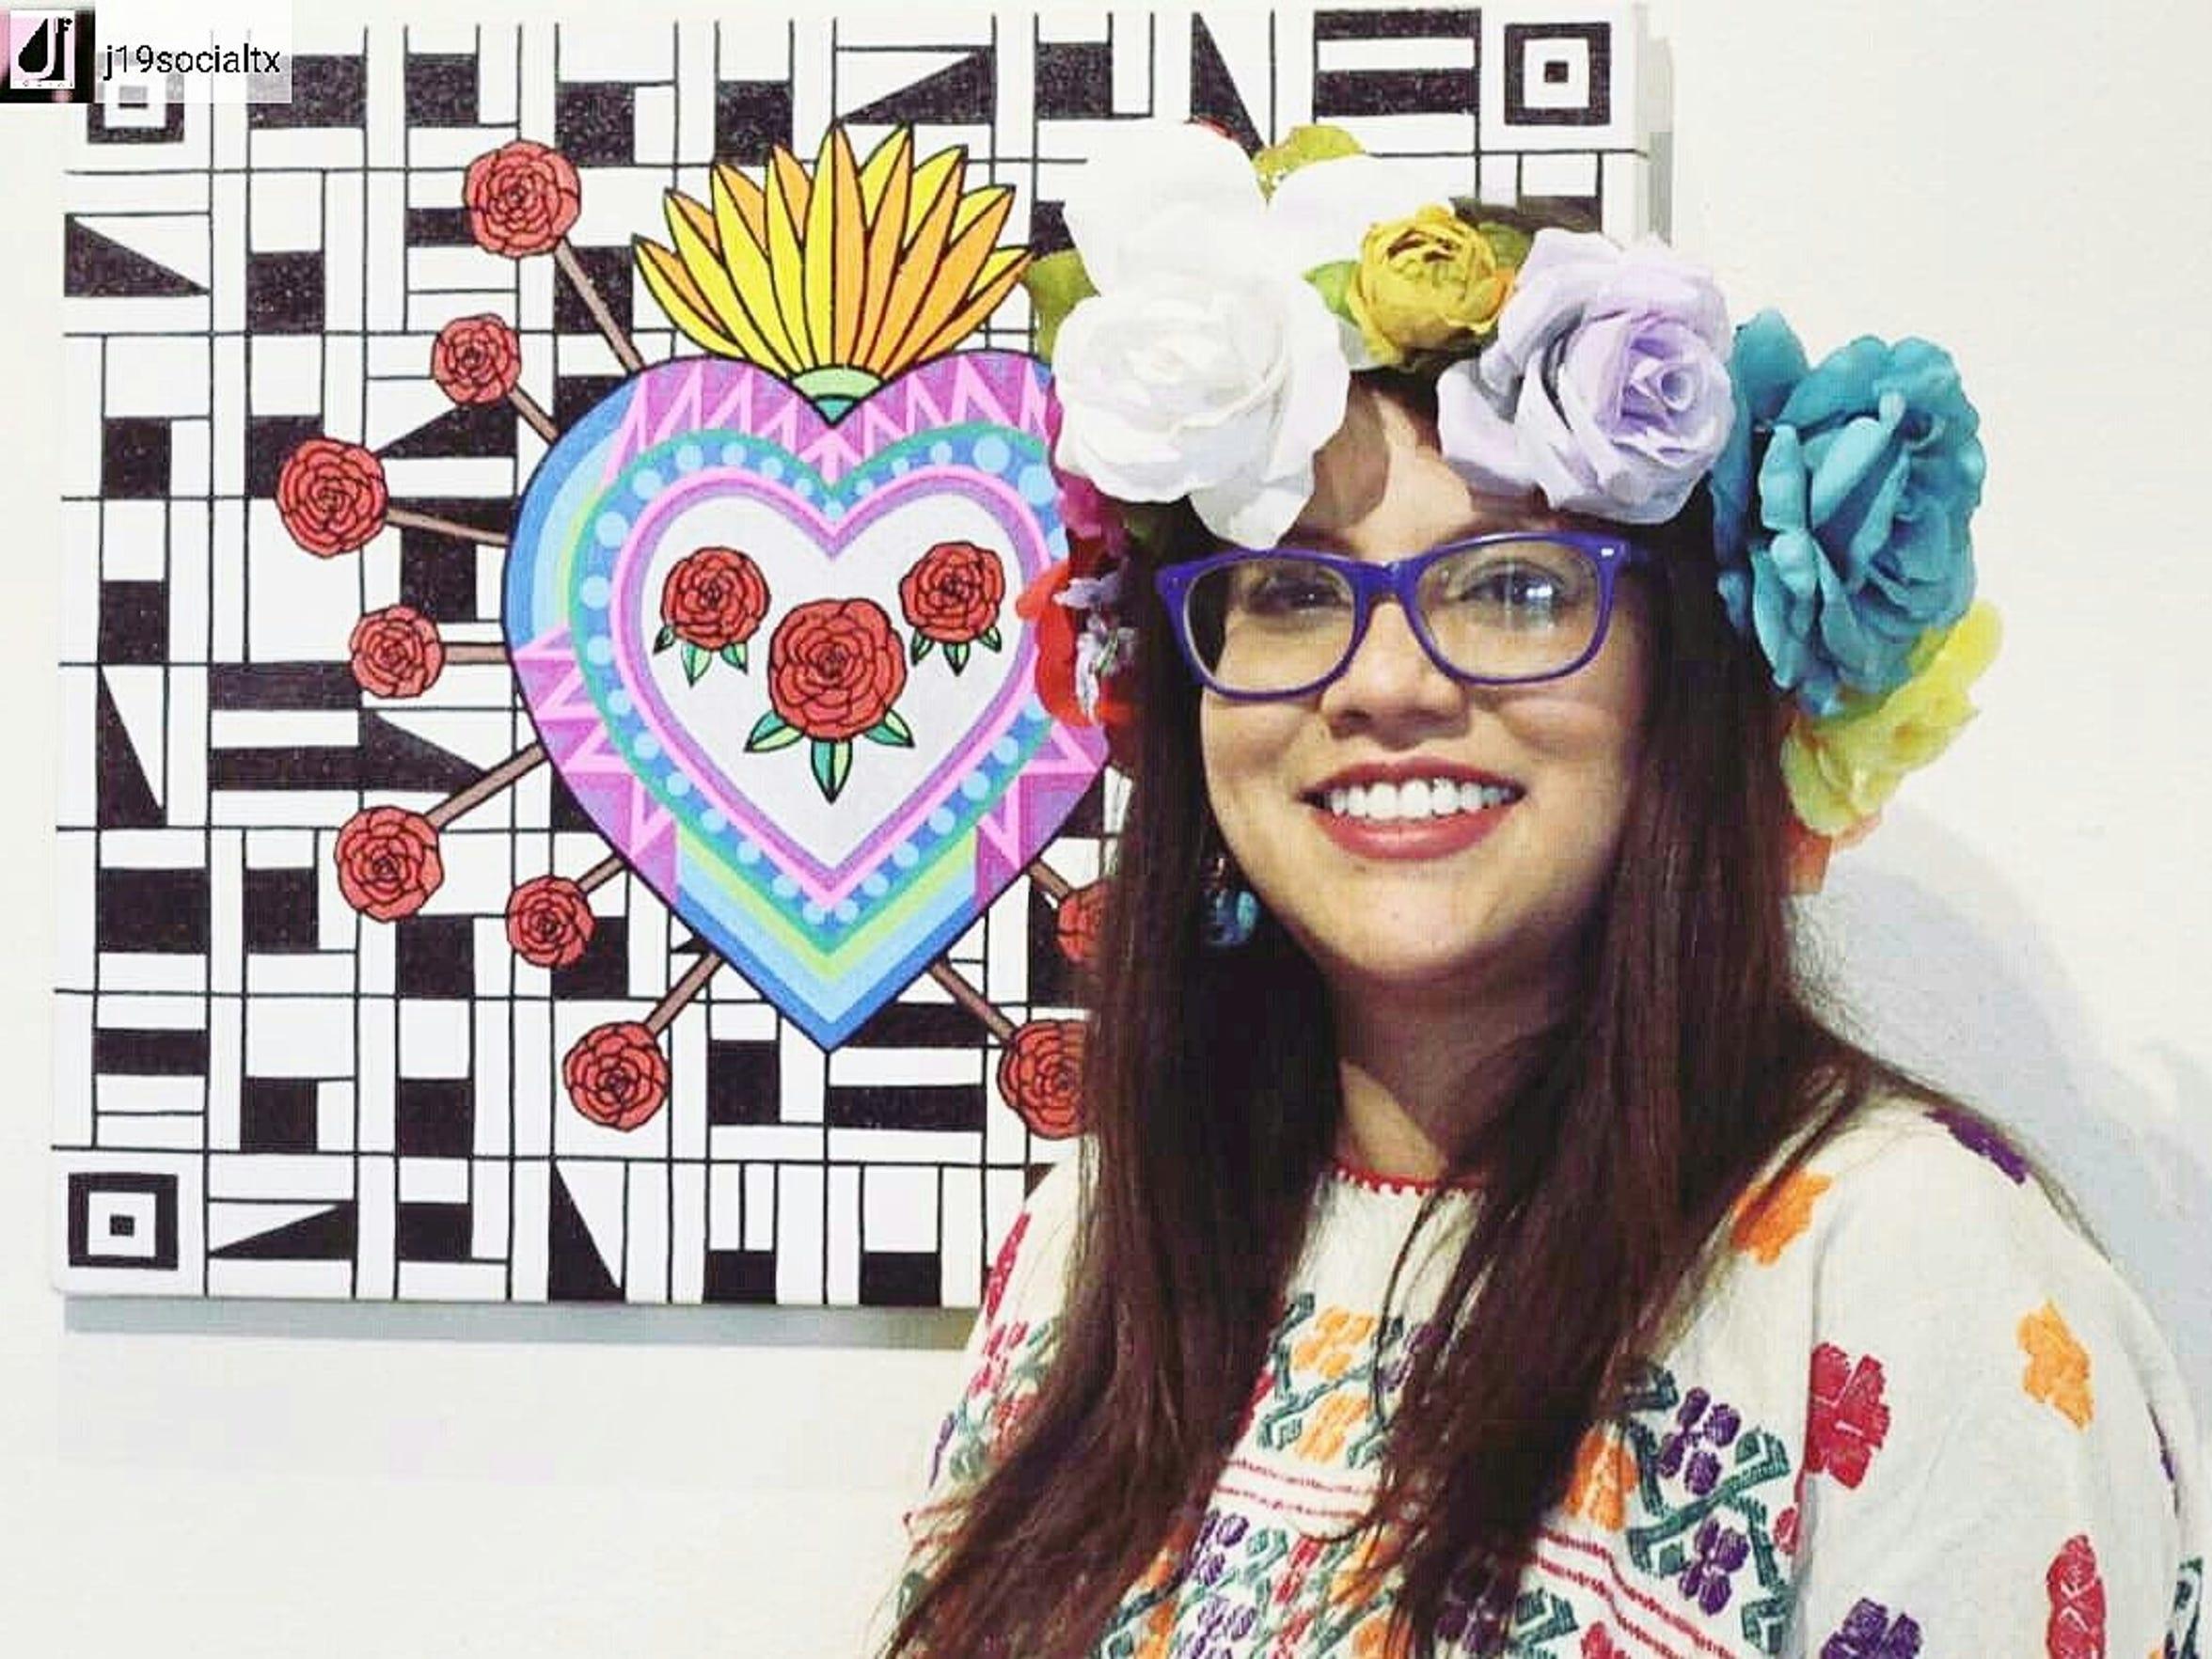 Chicana artist Mayra Zamora